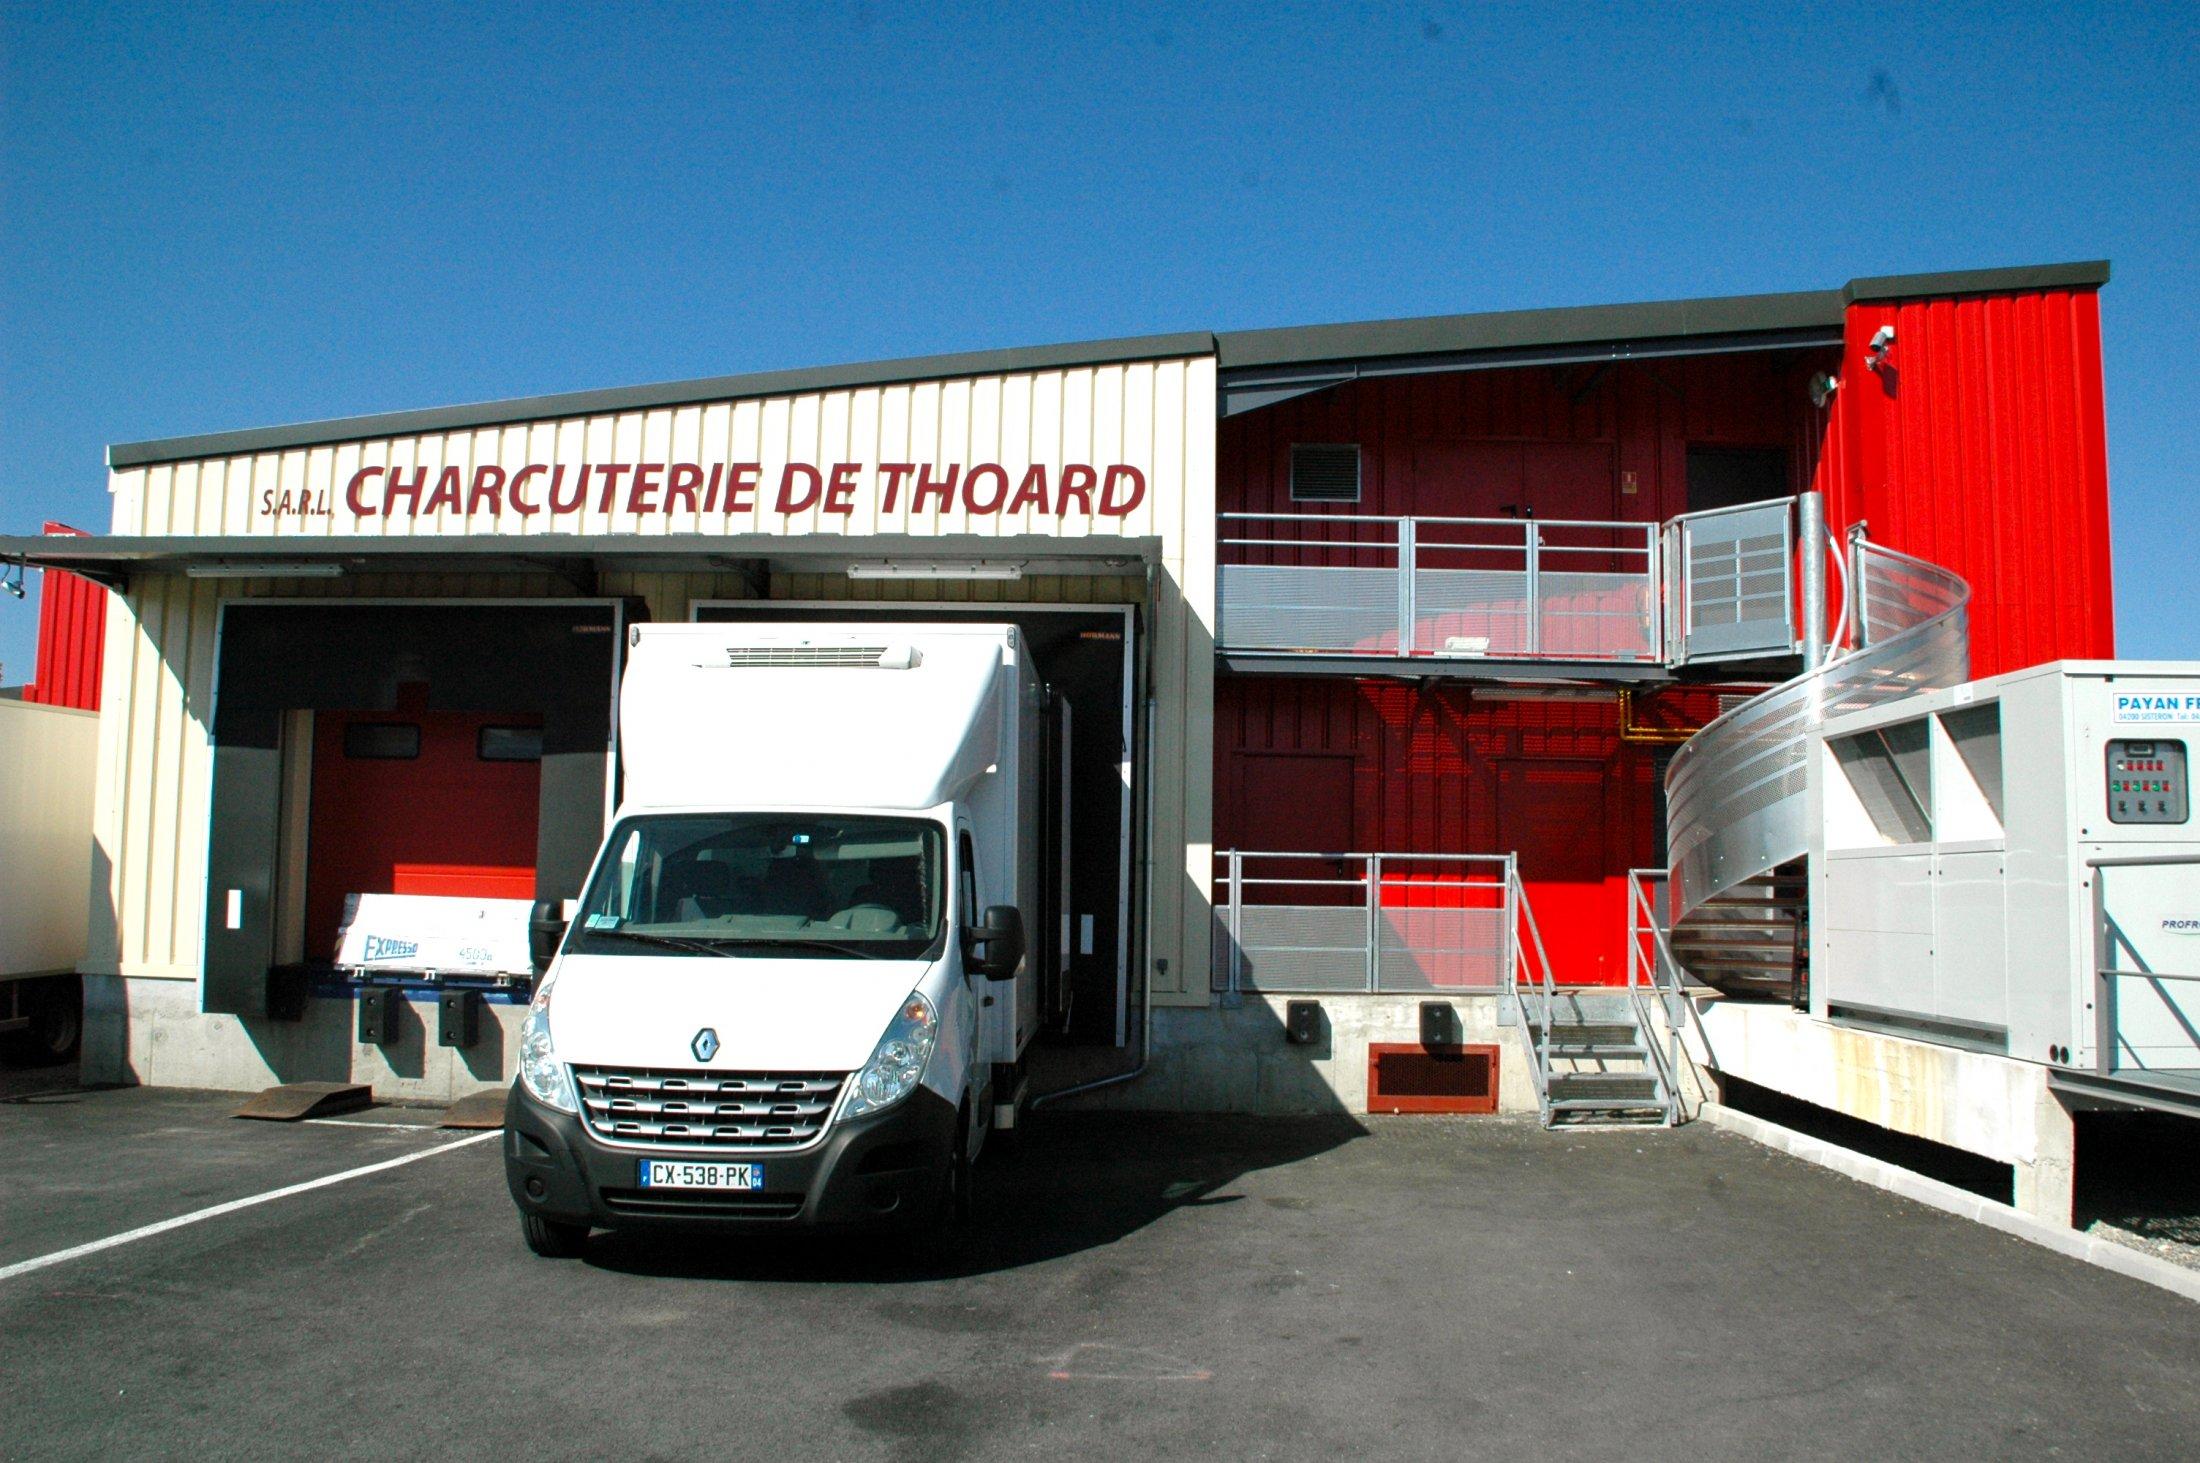 Charcuterie-thoard-2